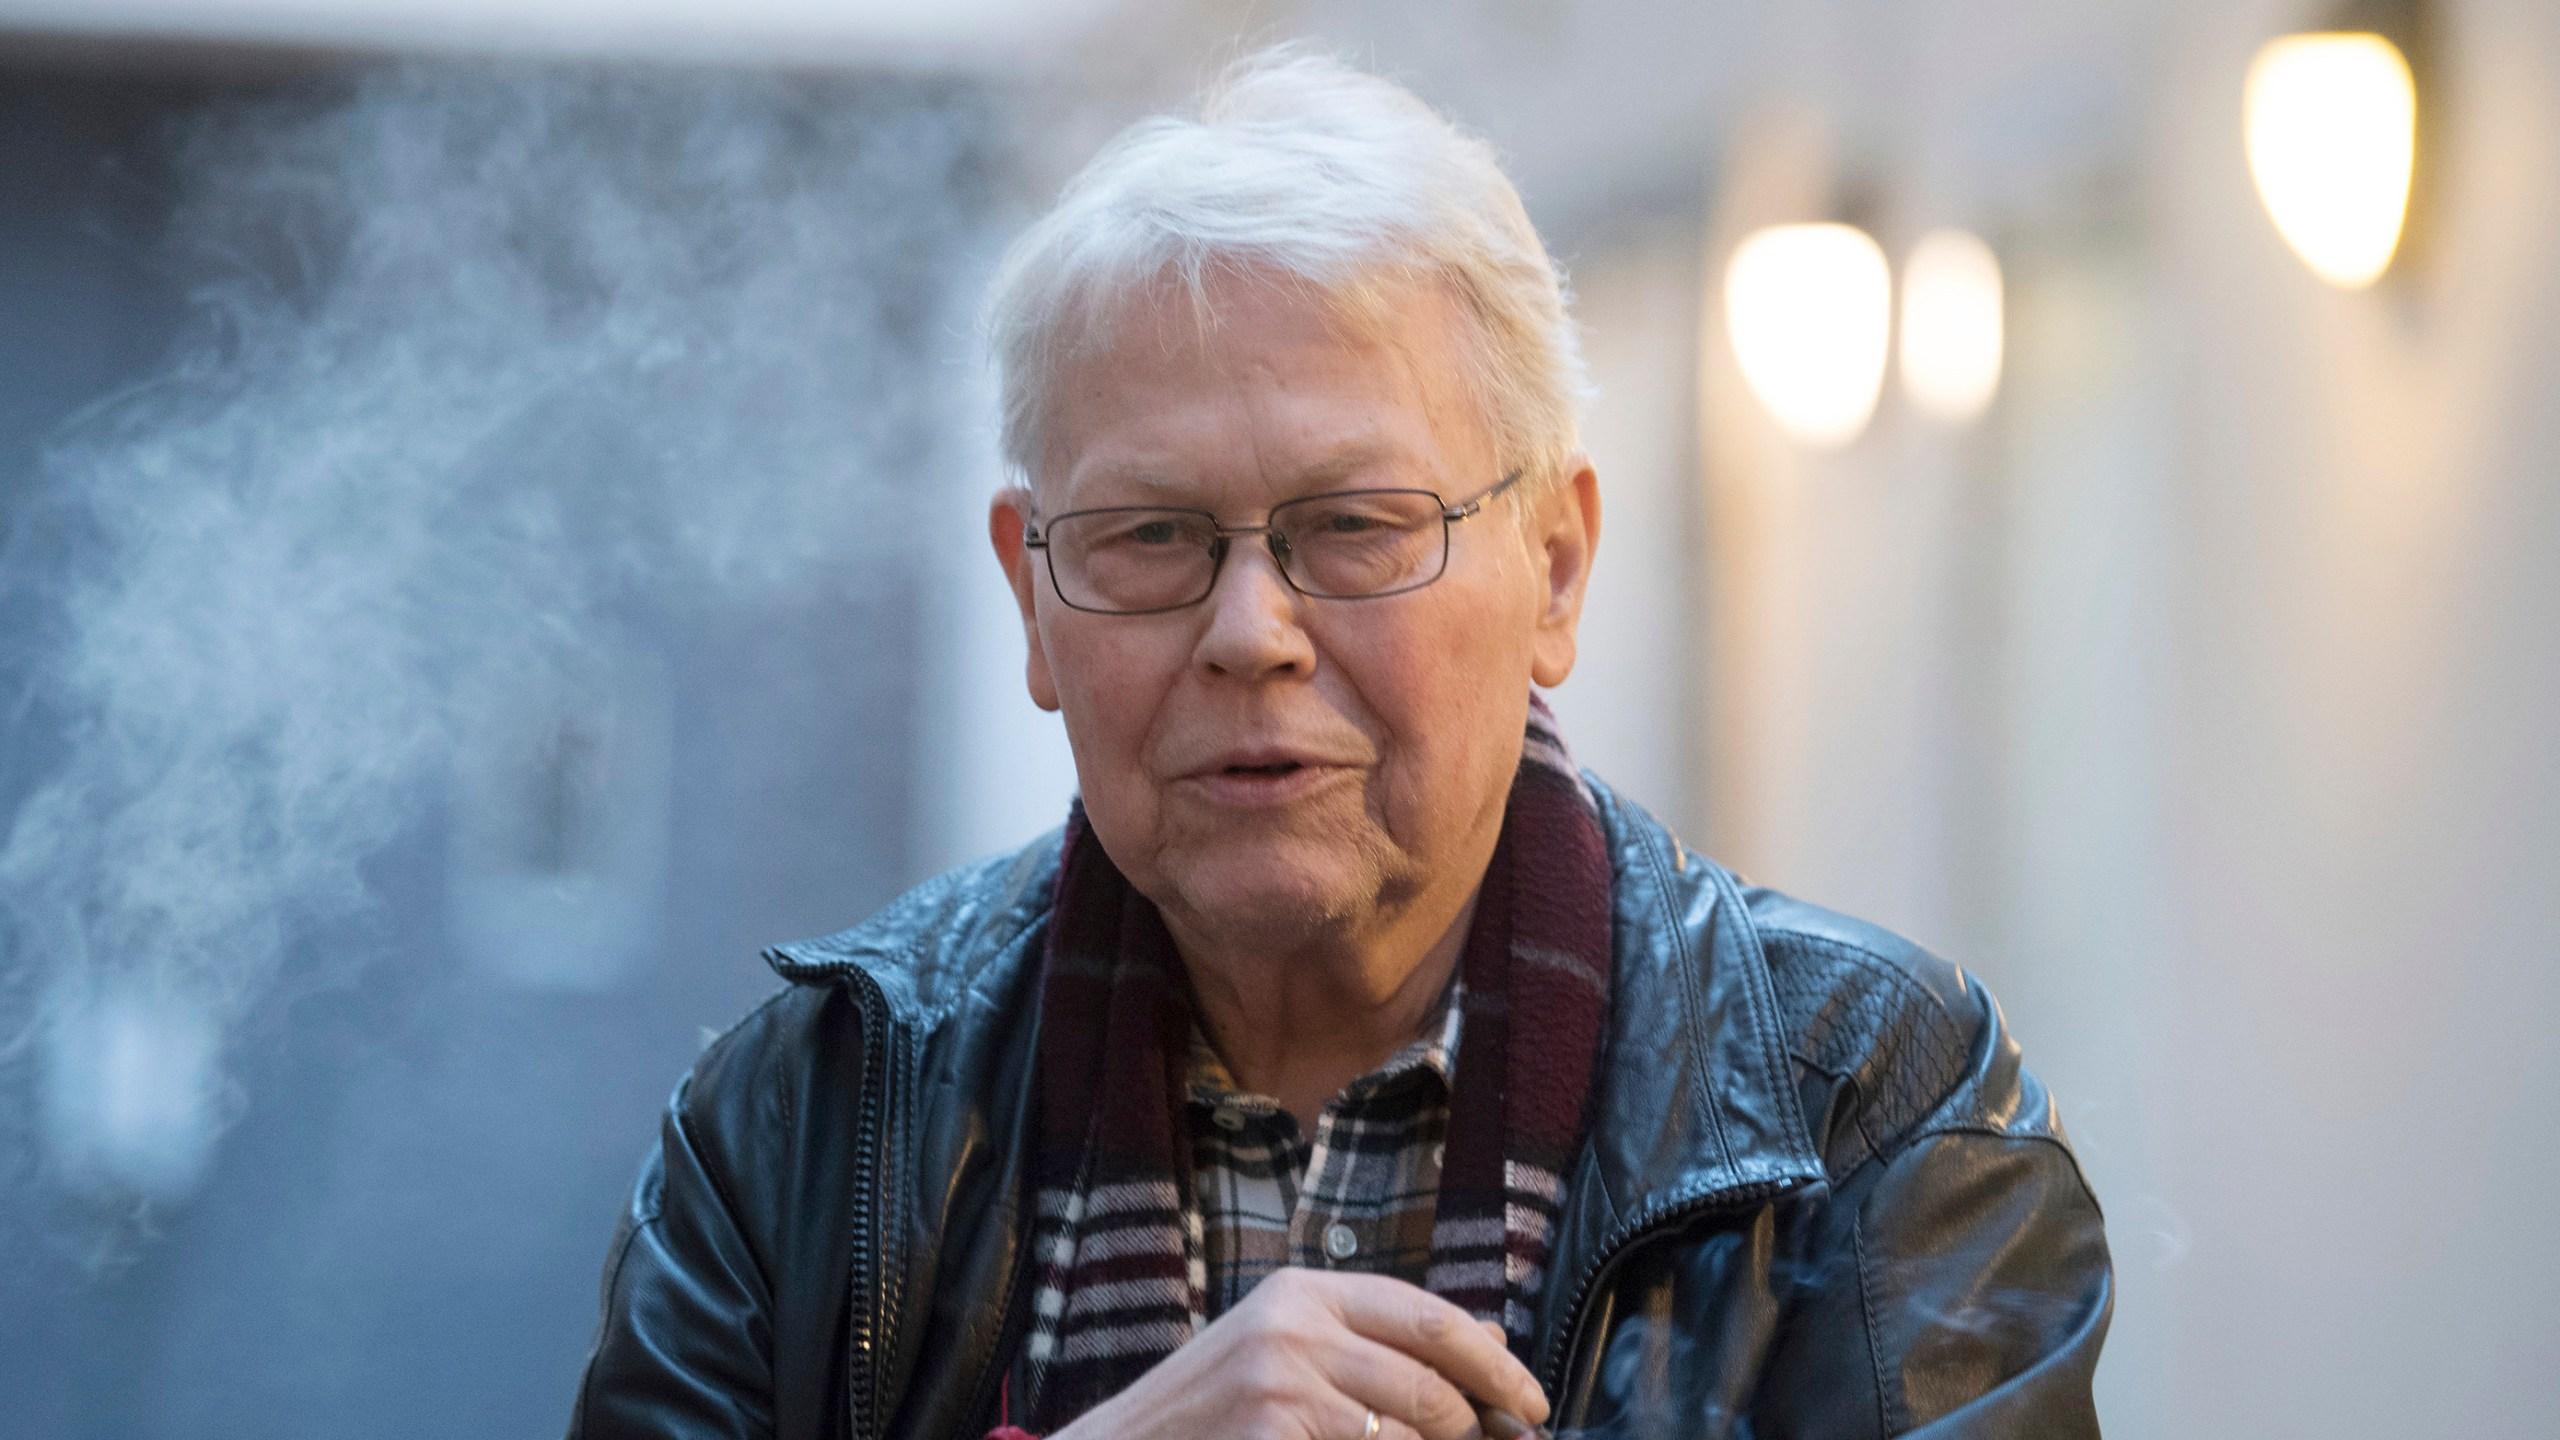 IMG HARRY KUPFER, German Opera Director and Academic